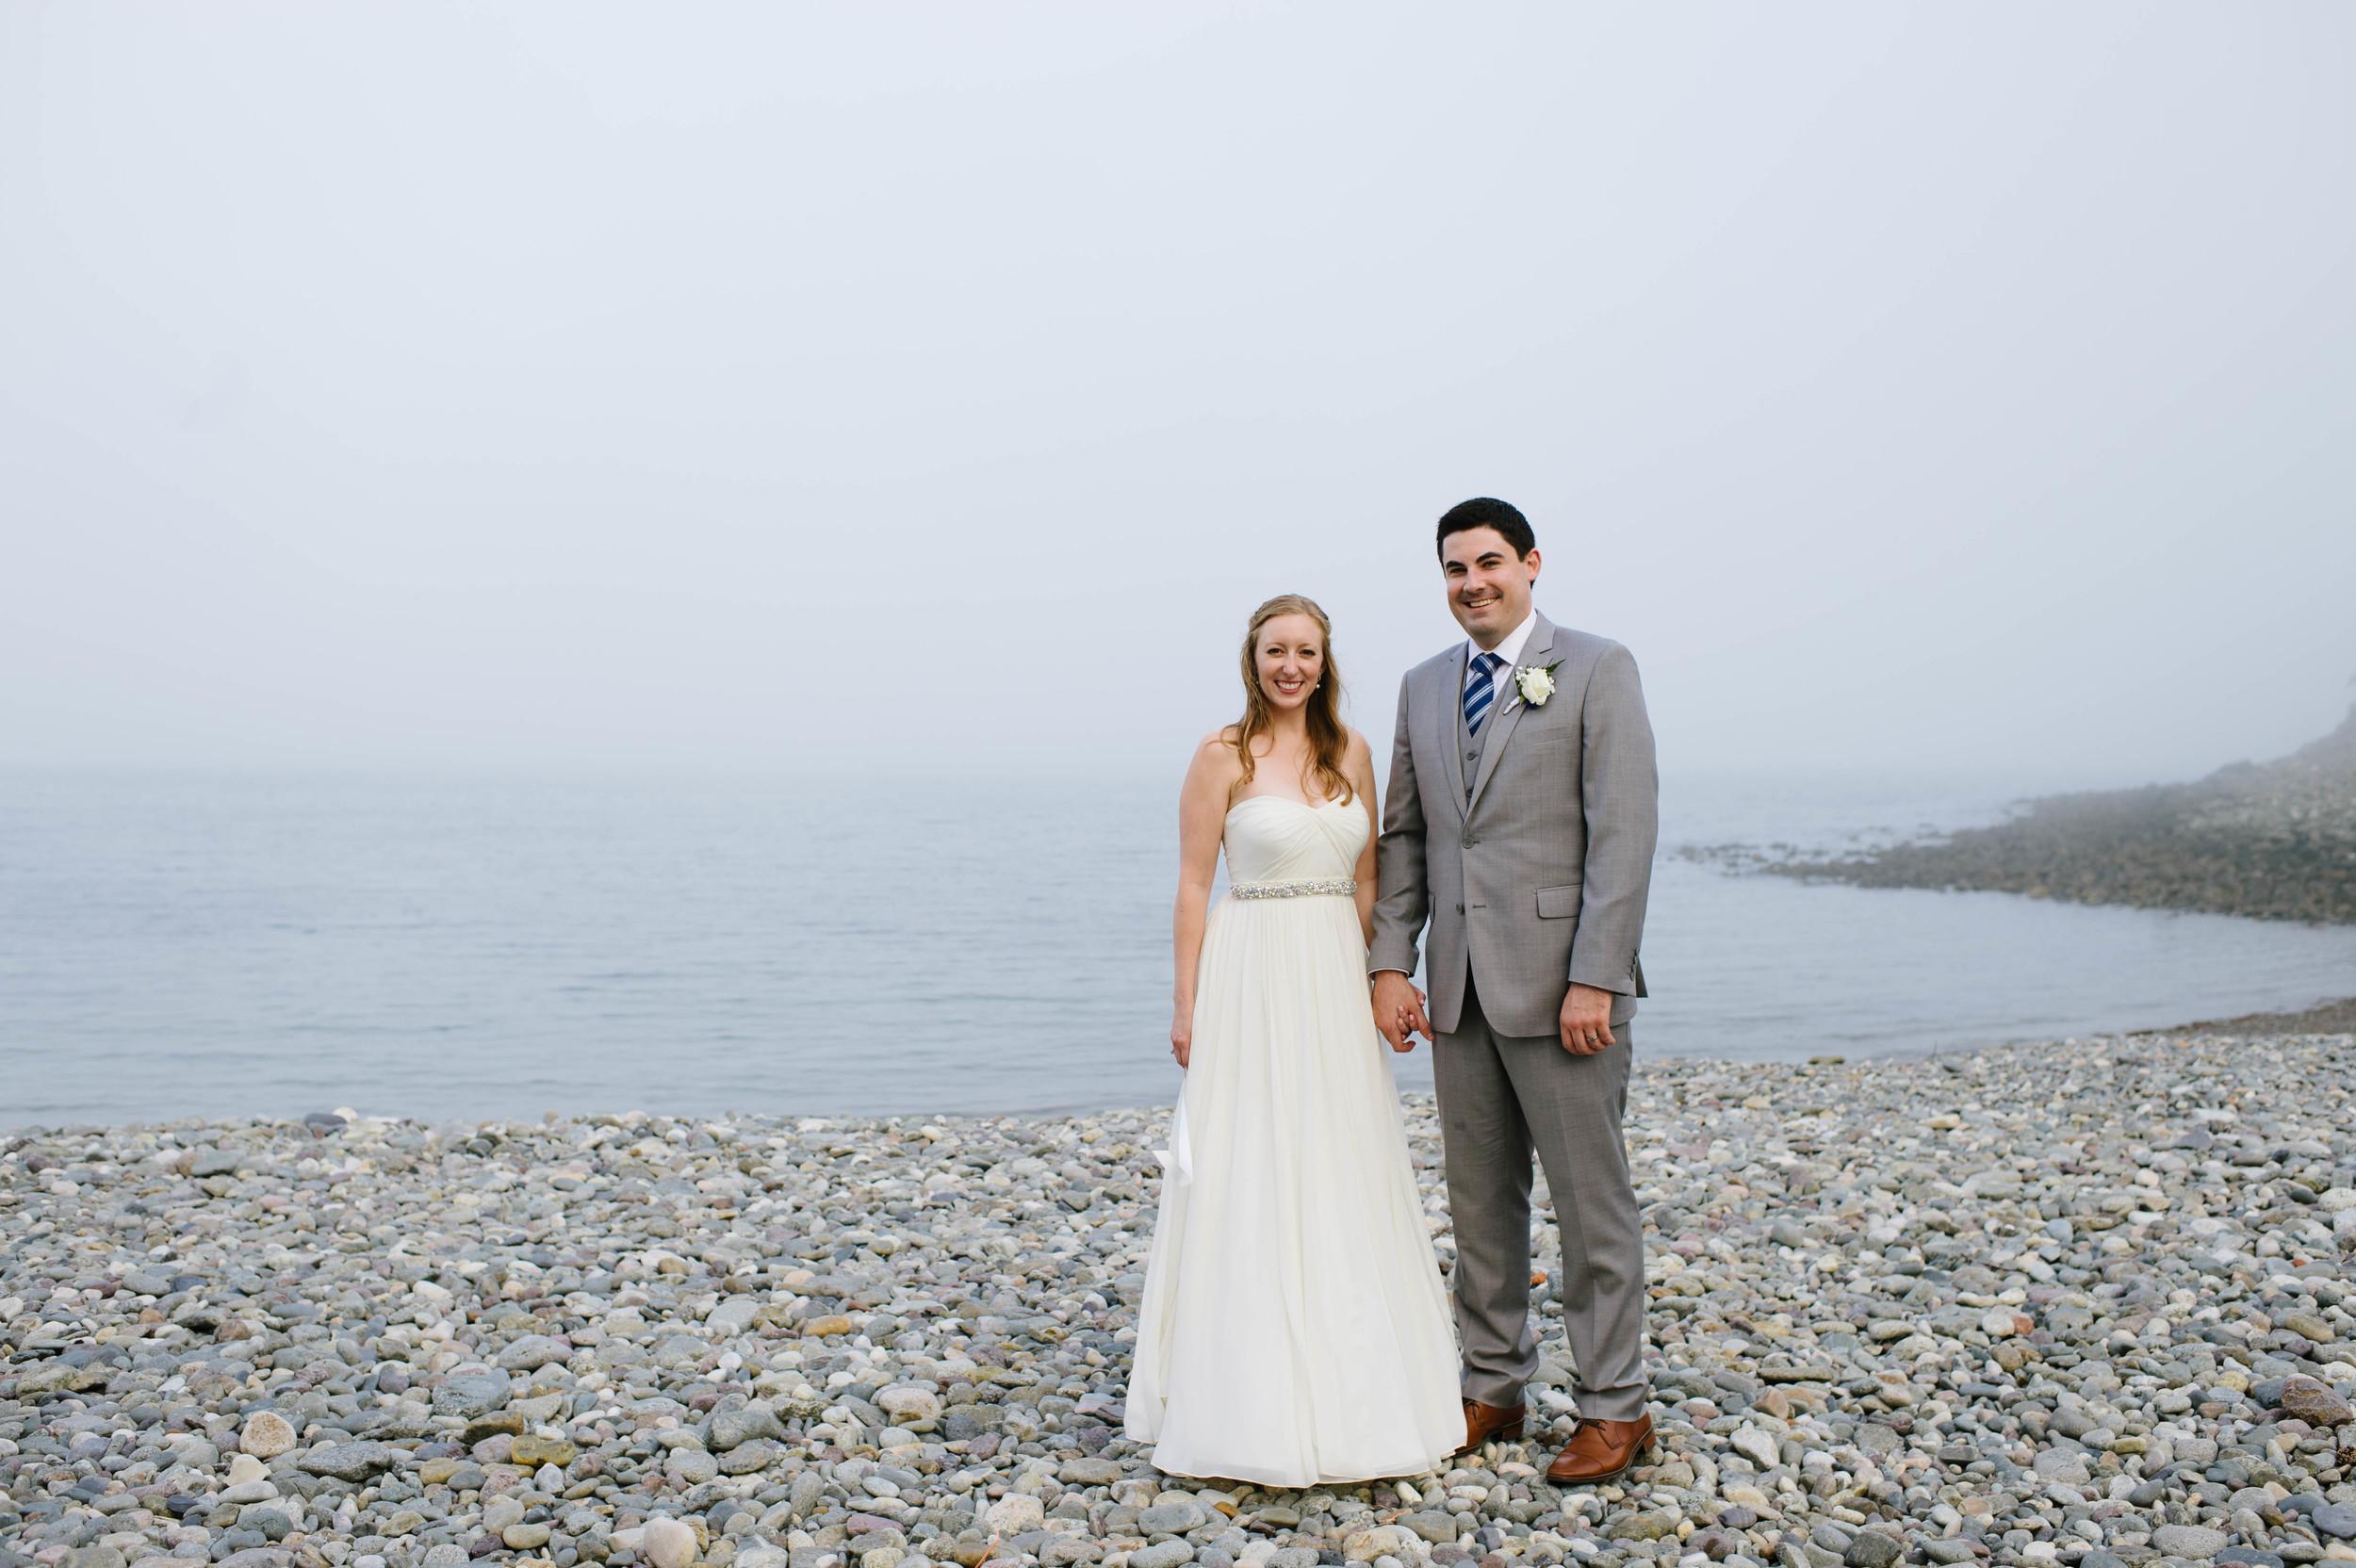 Northshore_Wedding_Boston015.jpg